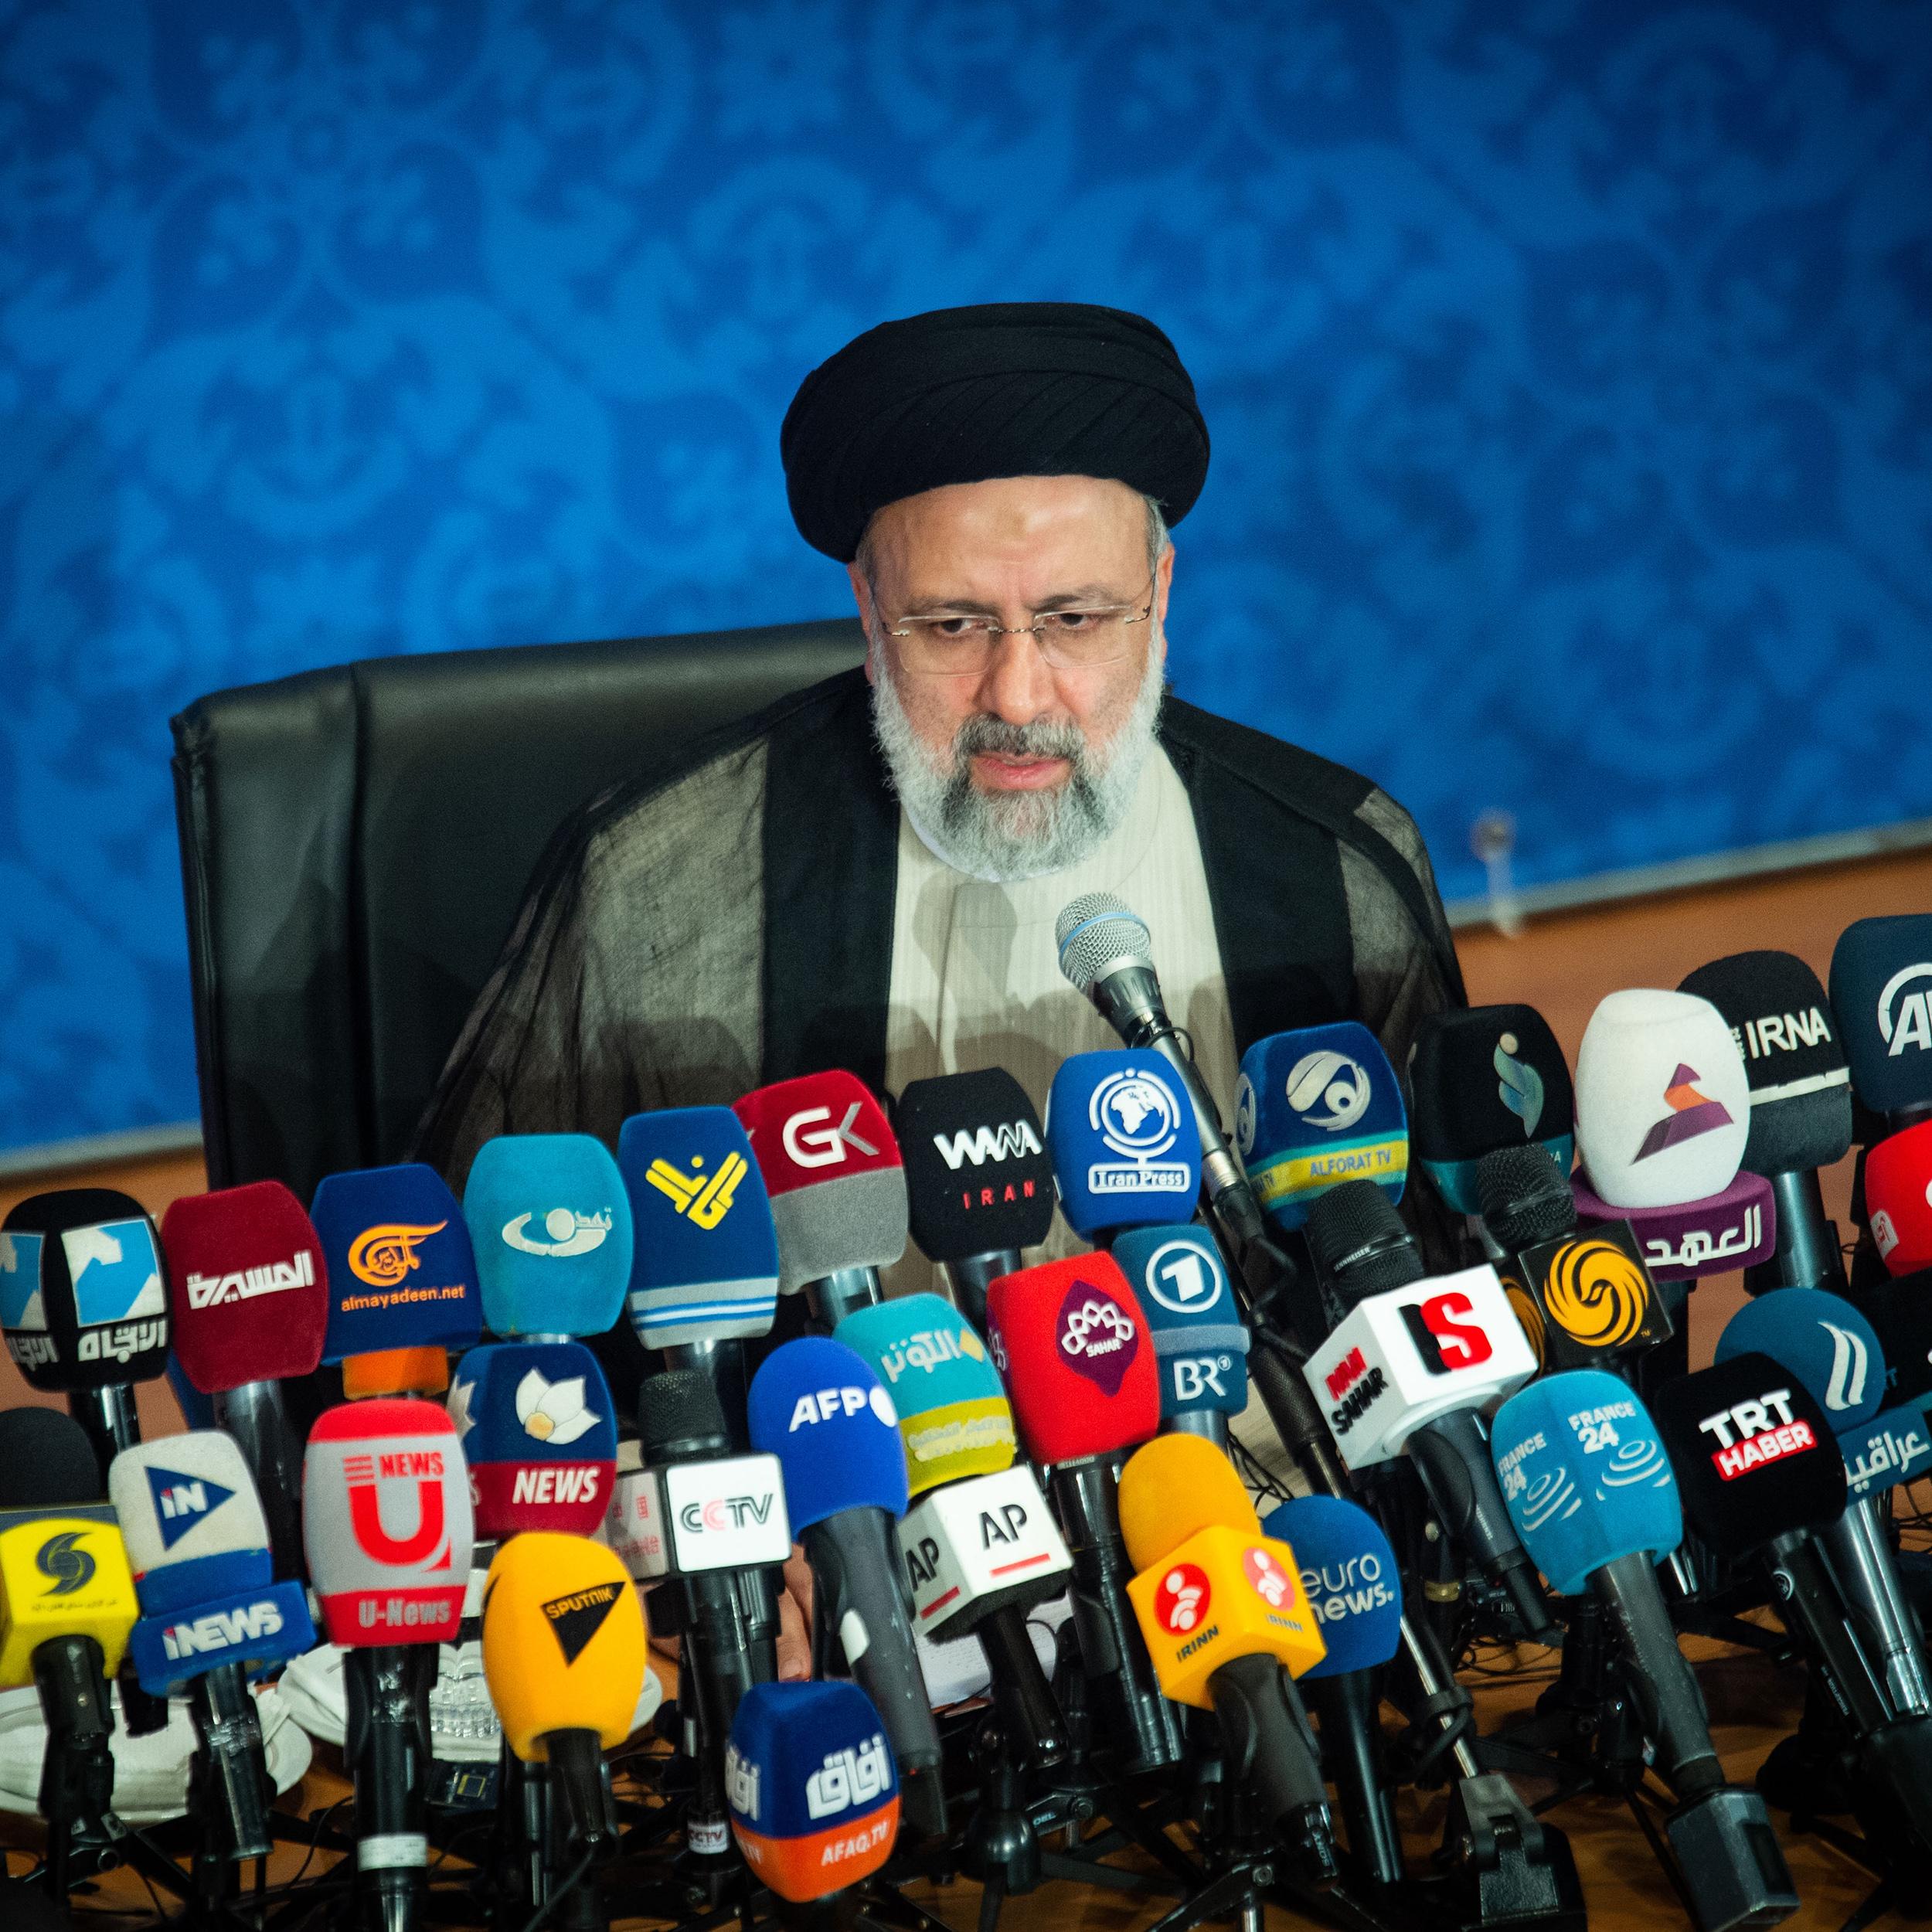 As Iran's hard-line new president takes office, Biden faces tough choices